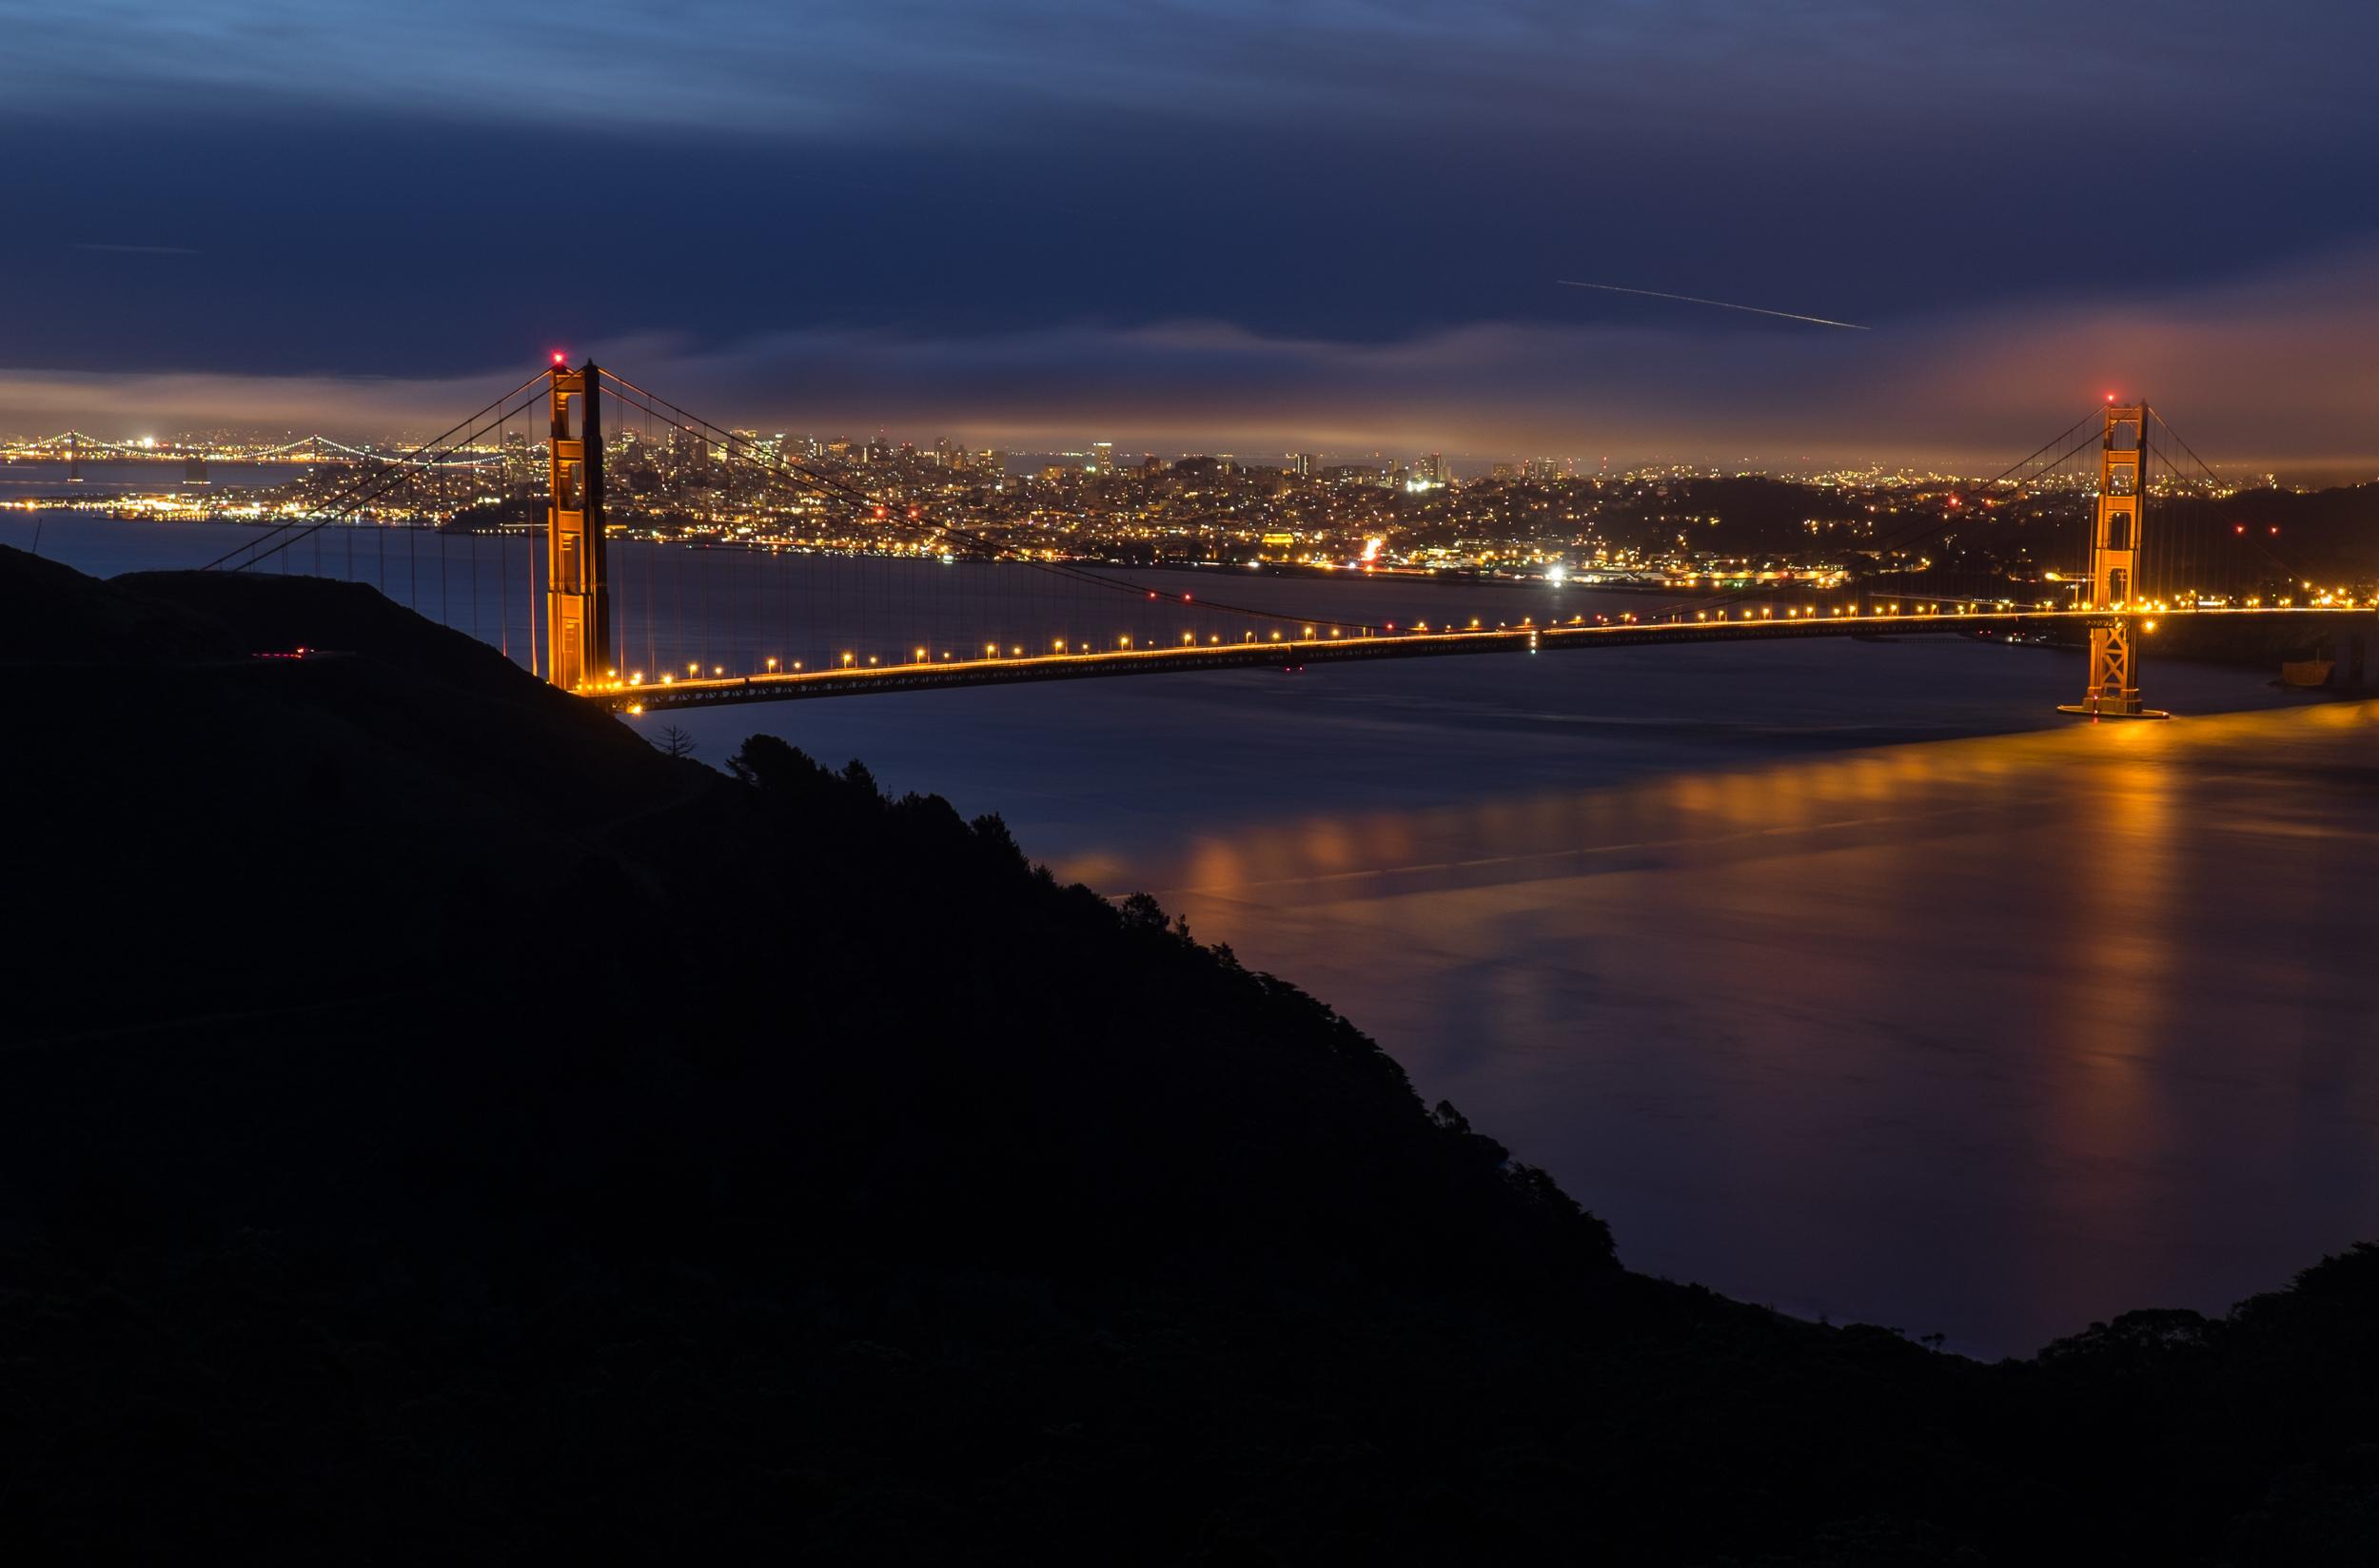 The Golden Gate Bridge a half hour prior to sunrise. 30 sec.@ f8, ISO 200.